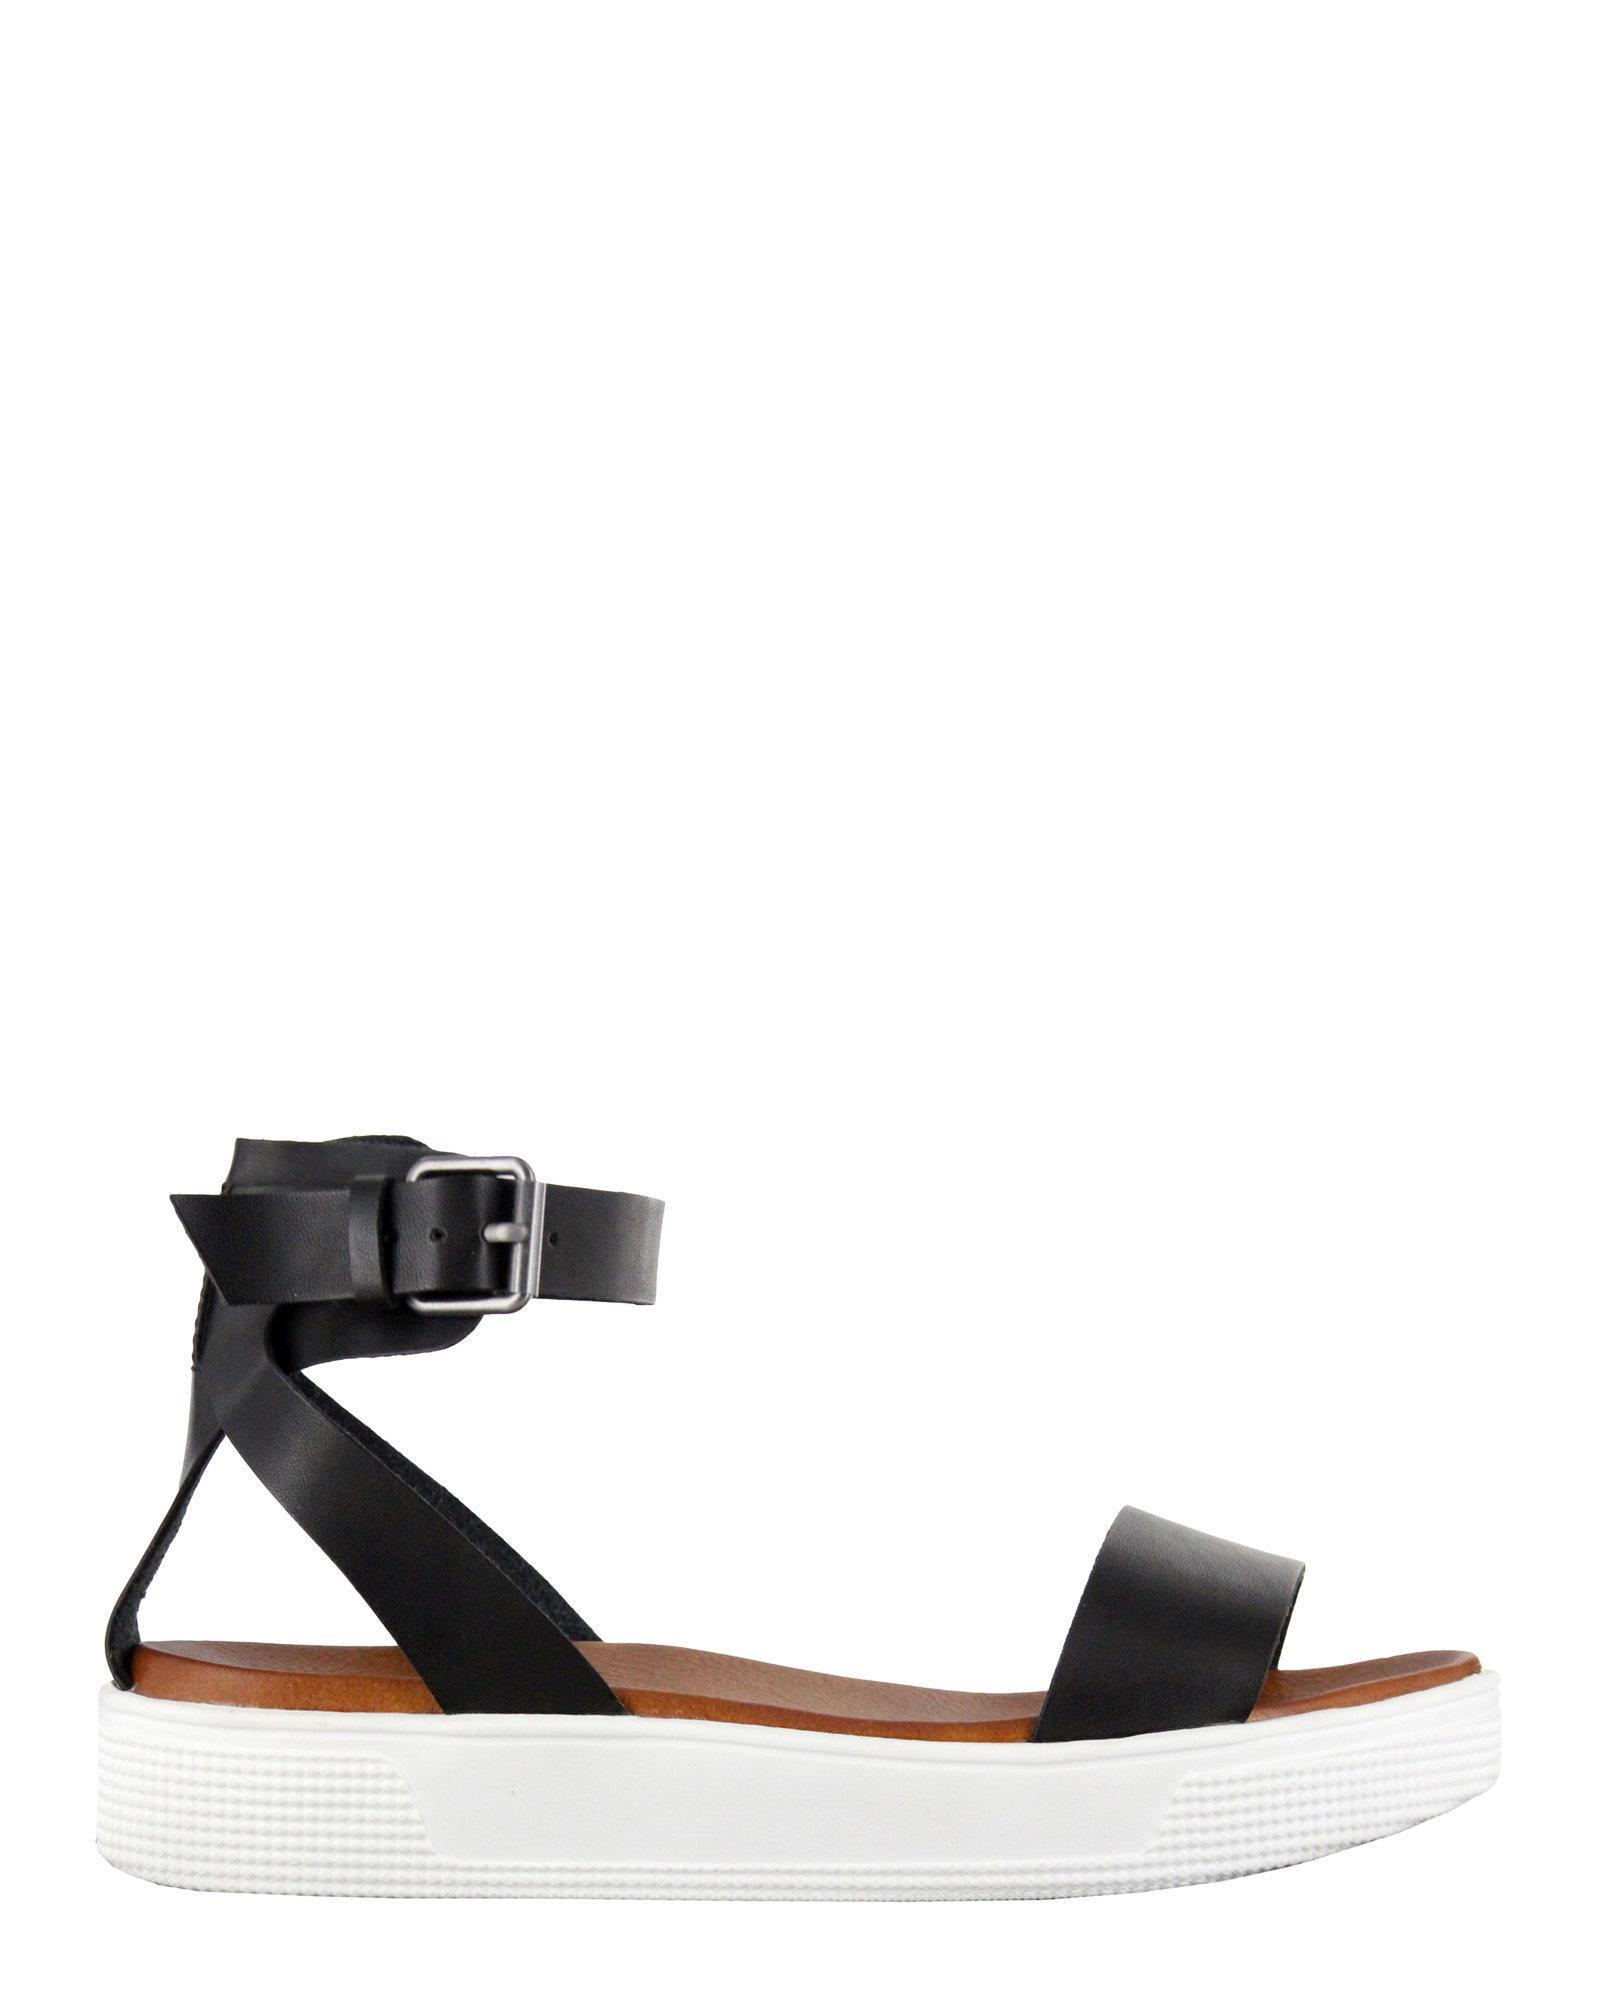 4ad03ce3ce72 Lyst - MIA Black Ellen Ankle Strap Sandals in Black